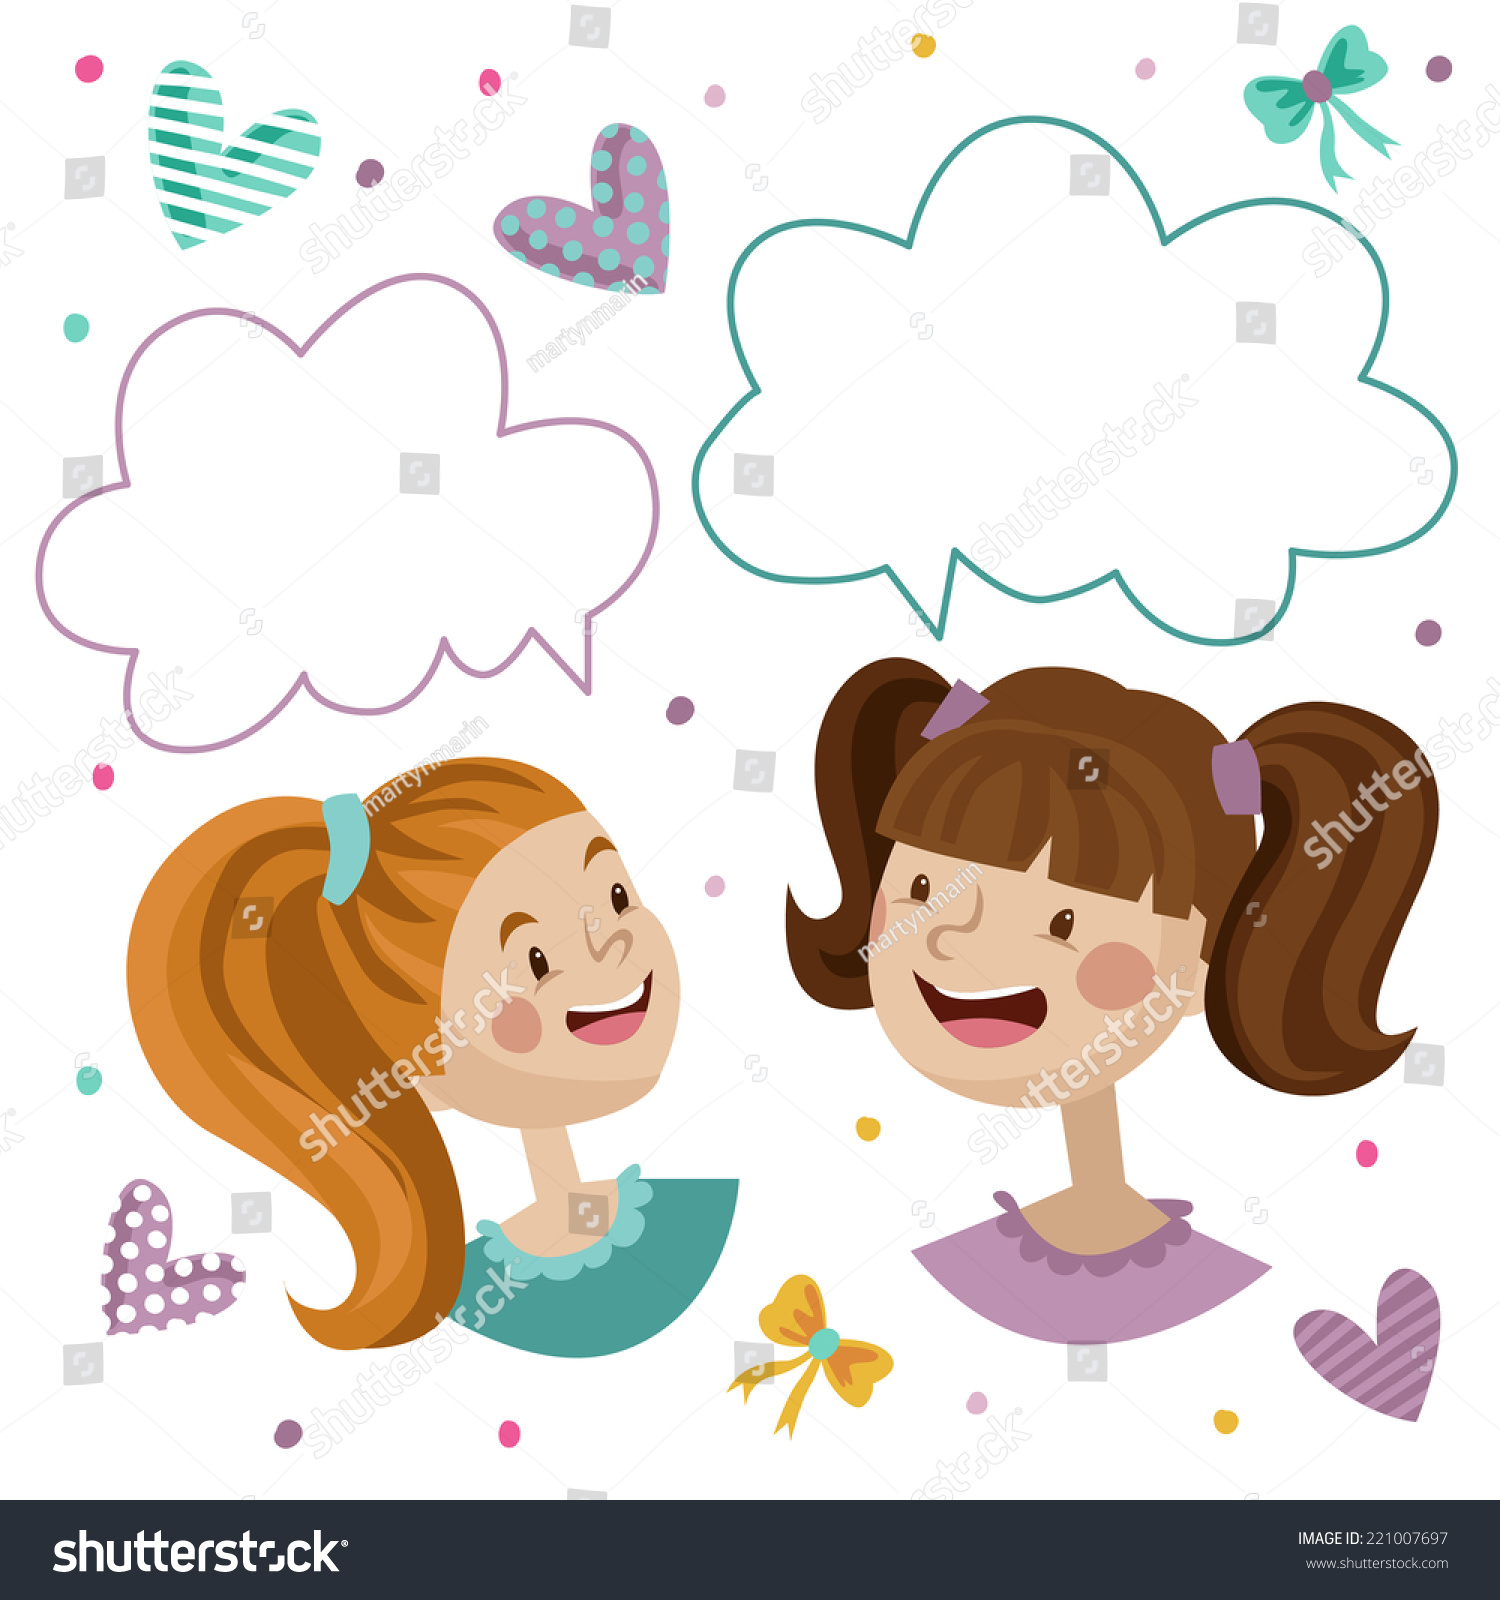 Two Children Talking Stock Images RoyaltyFree Images